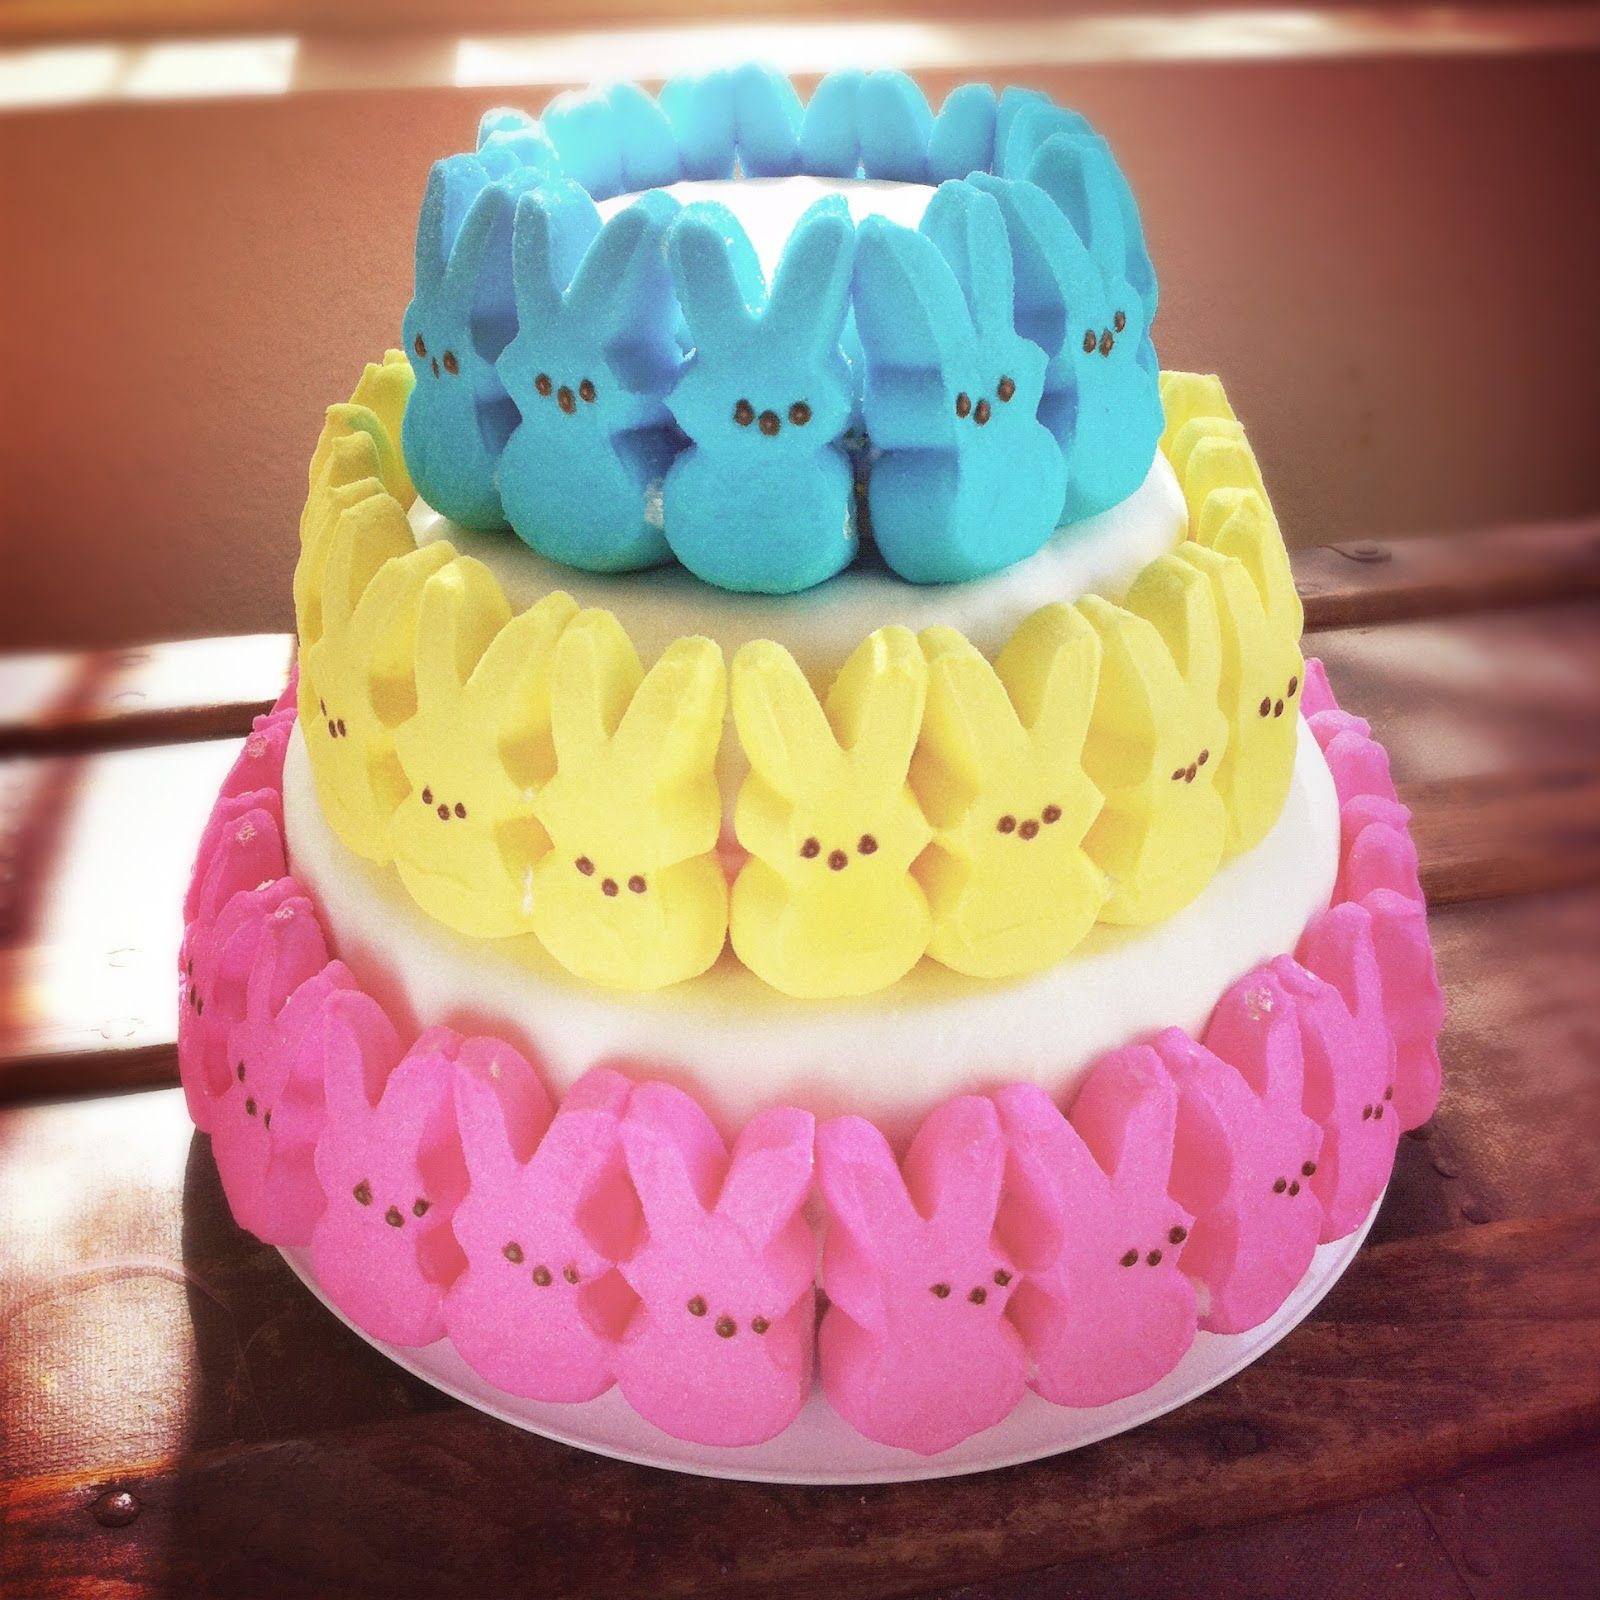 Bunny Peep Cake | Hoppy Easter! | Pinterest | Peeps, Bunny and Cake